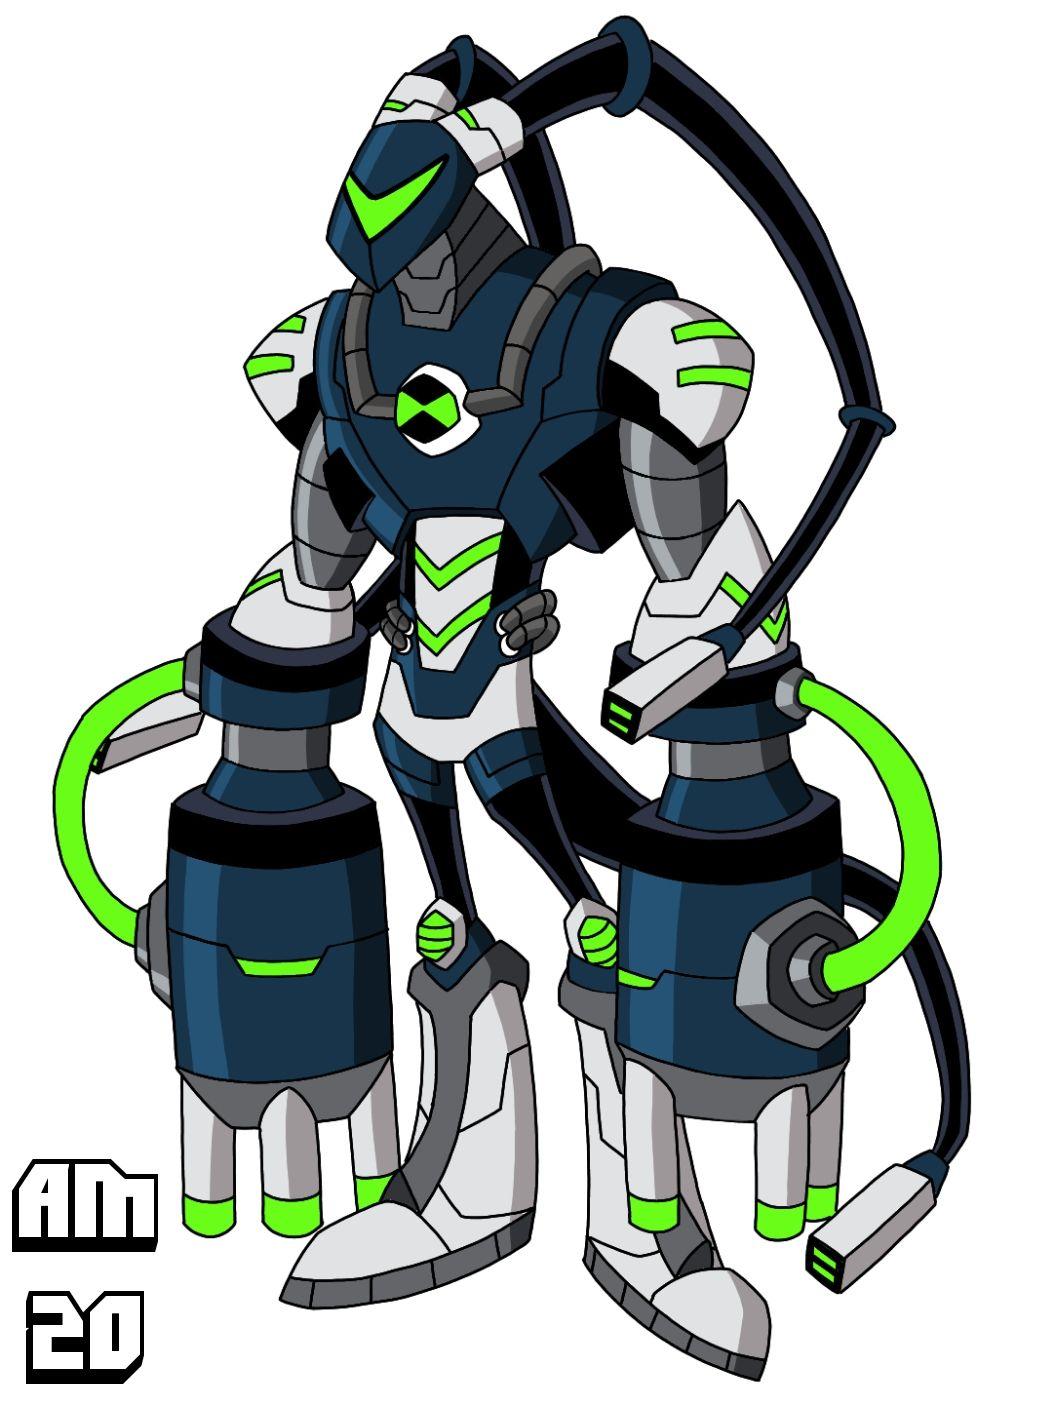 Omni Kix Armor Feedback By Artmachband196 On Deviantart Ben 10 Comics Ben 10 Omniverse Ben 10